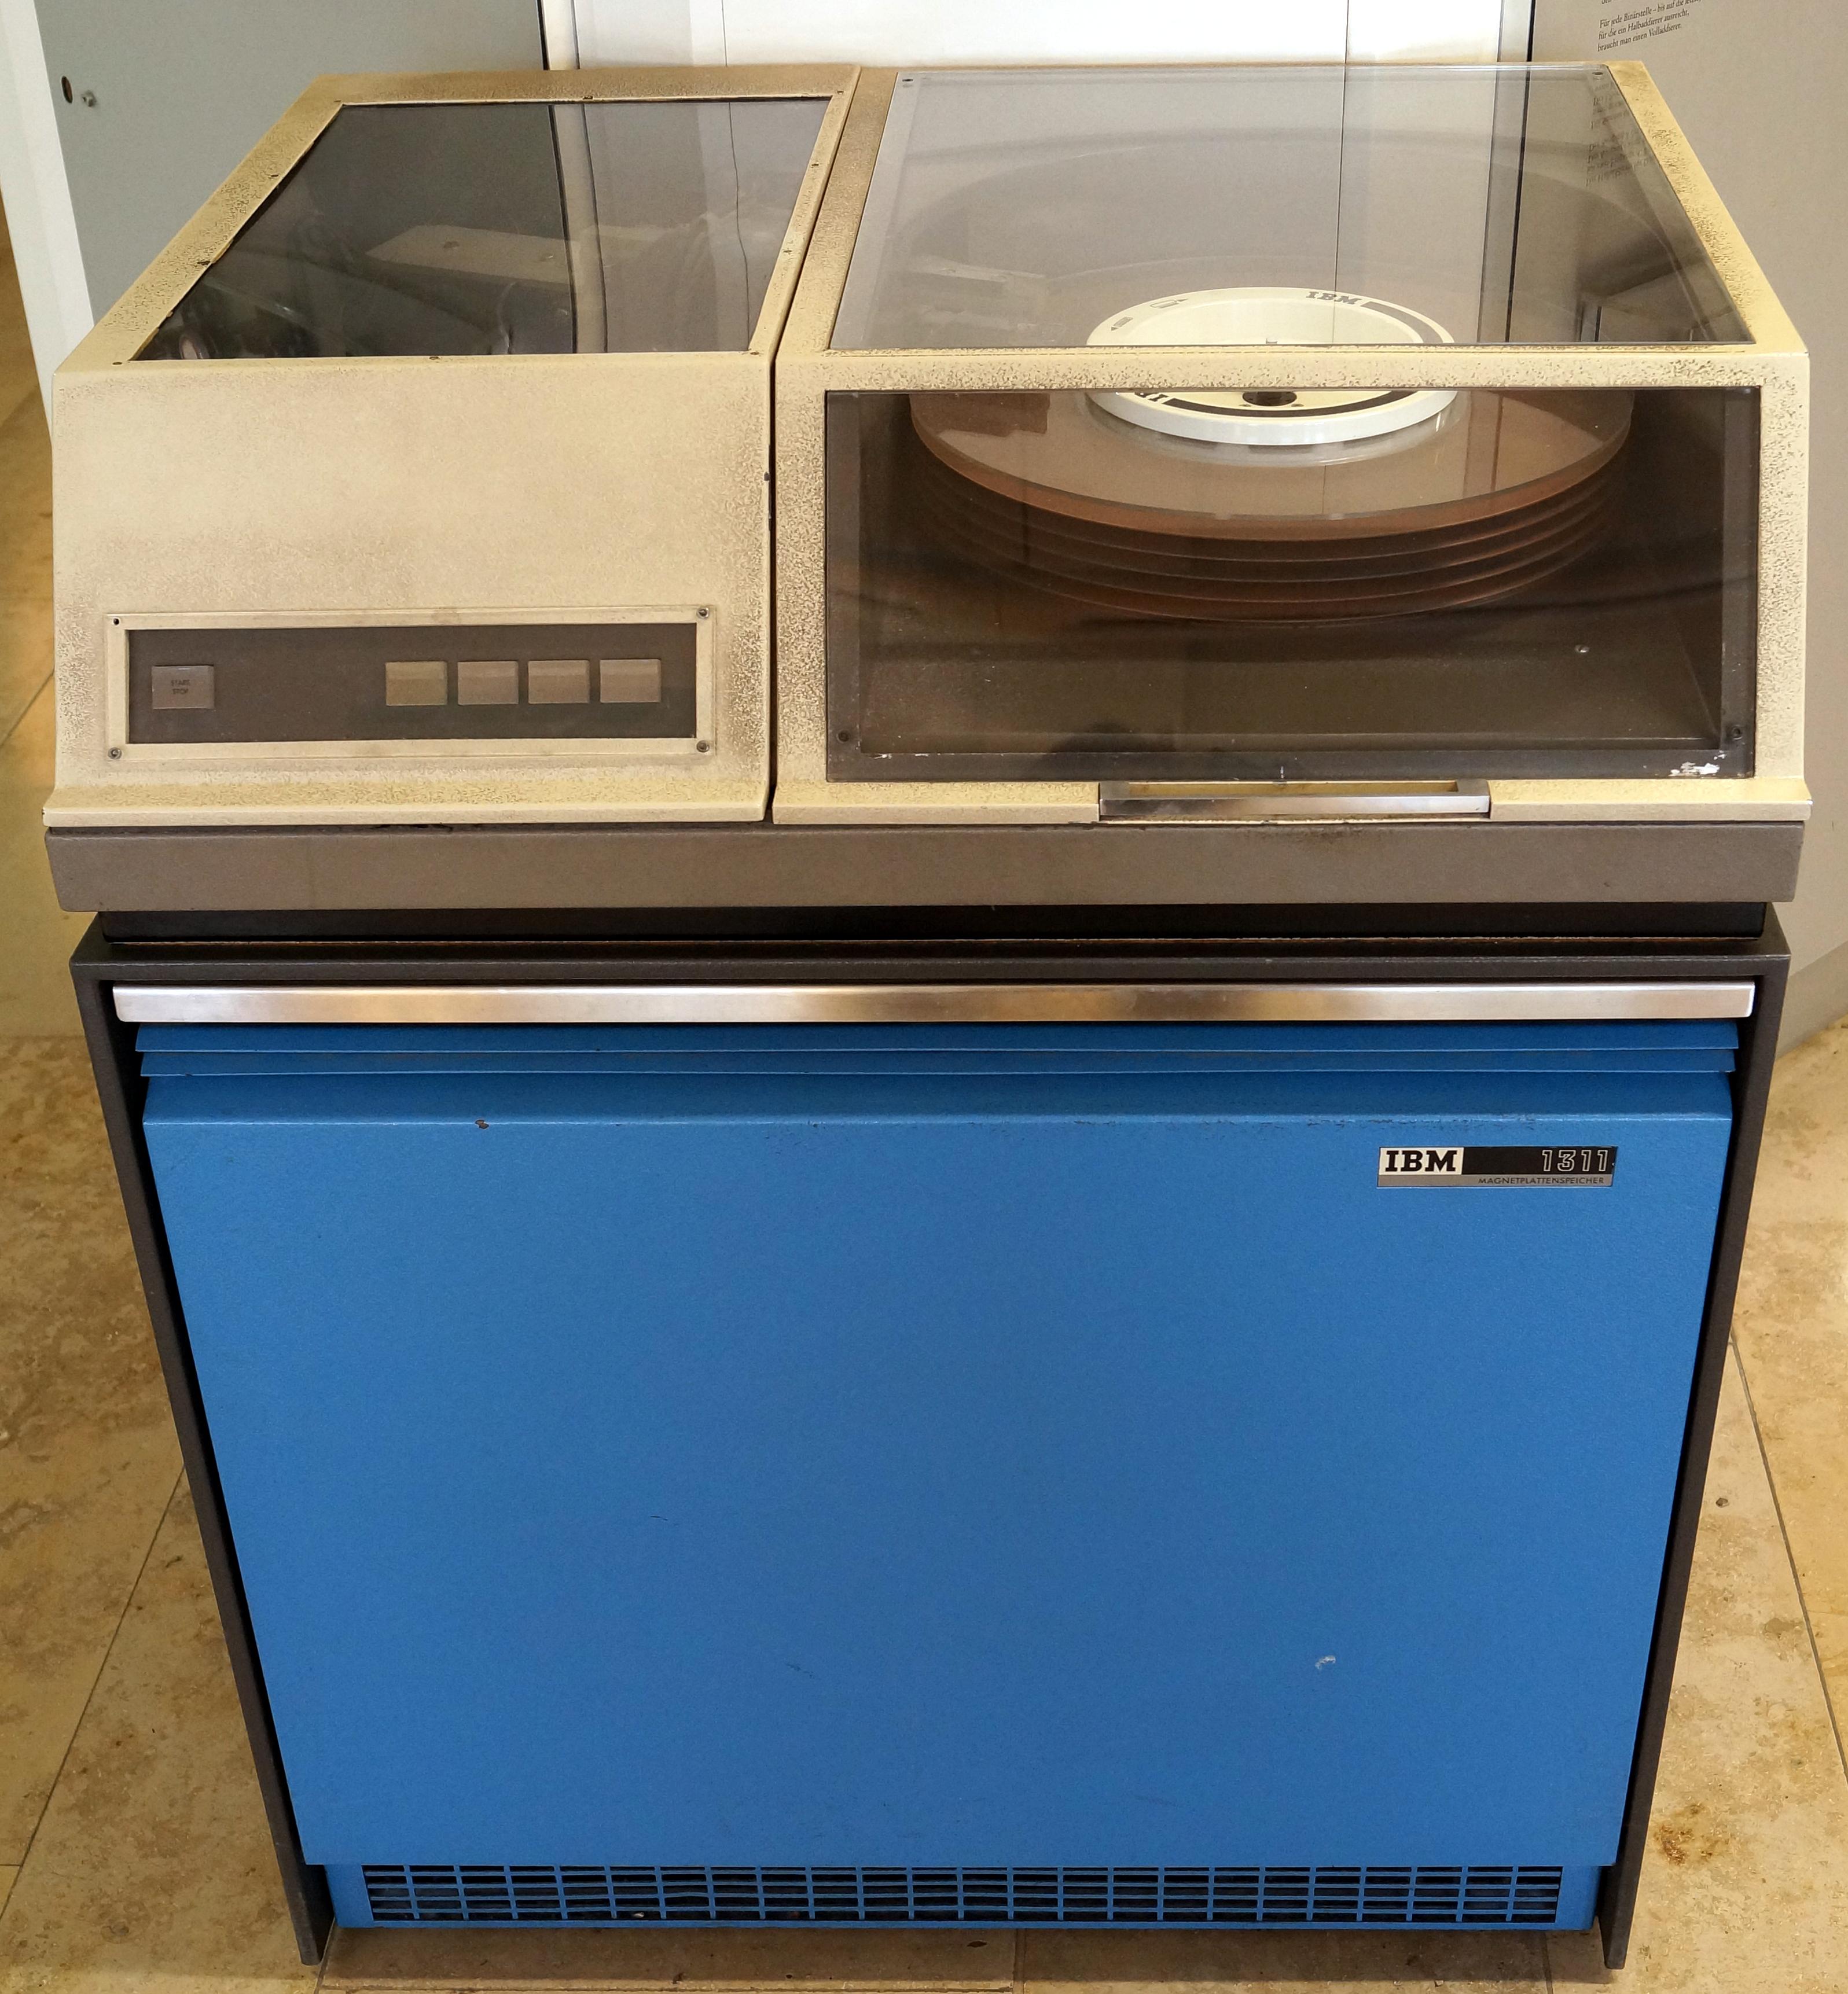 File:IBM 1311.jpg